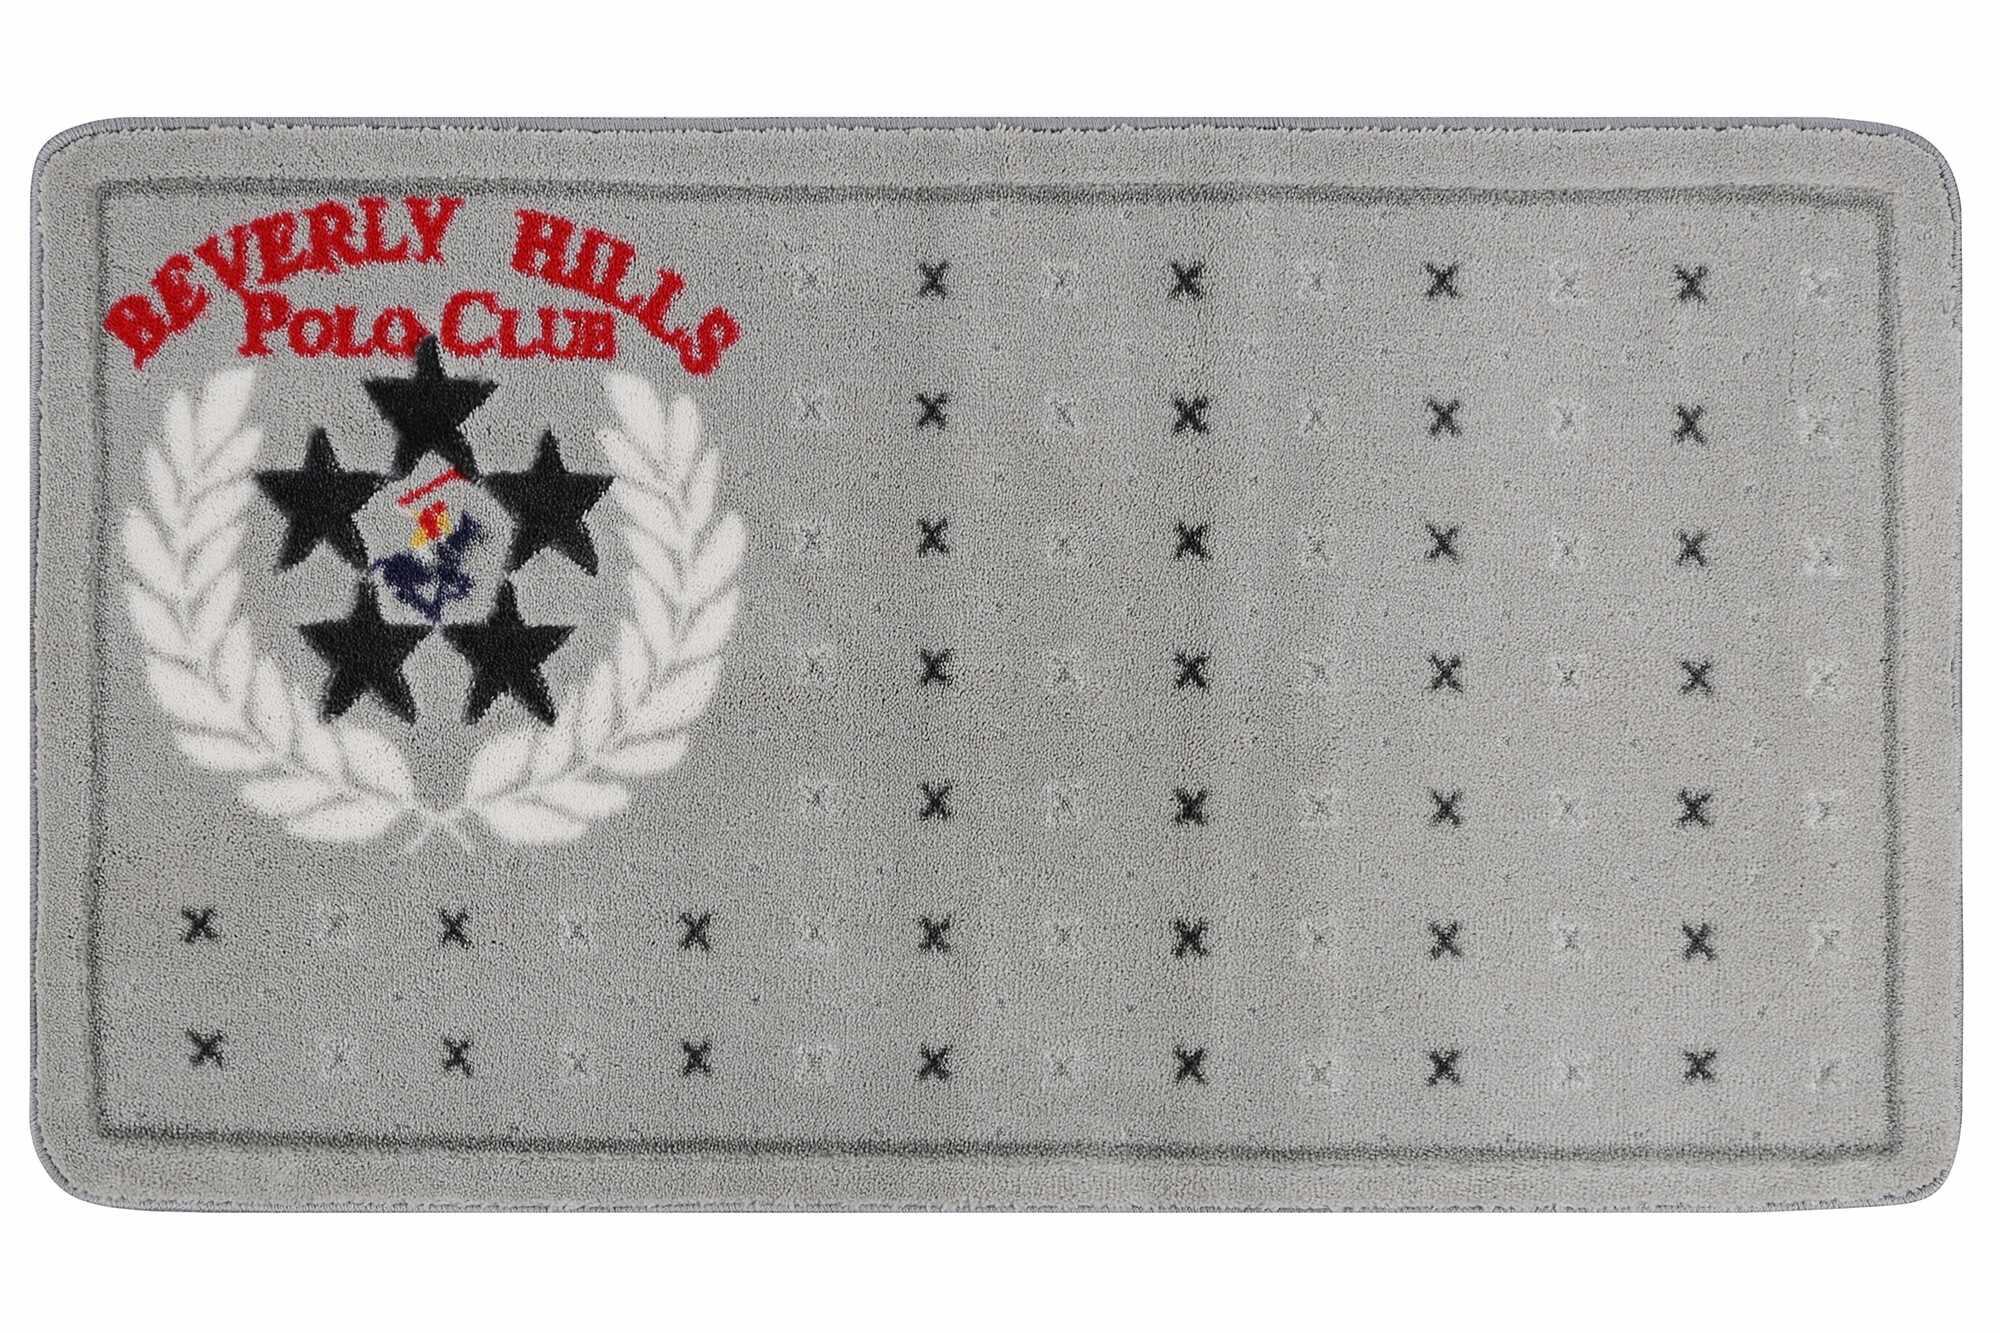 Covoras pentru baie Beverly Hills Polo Club 317 Gri, 67 x 120 cm la pret 225 lei